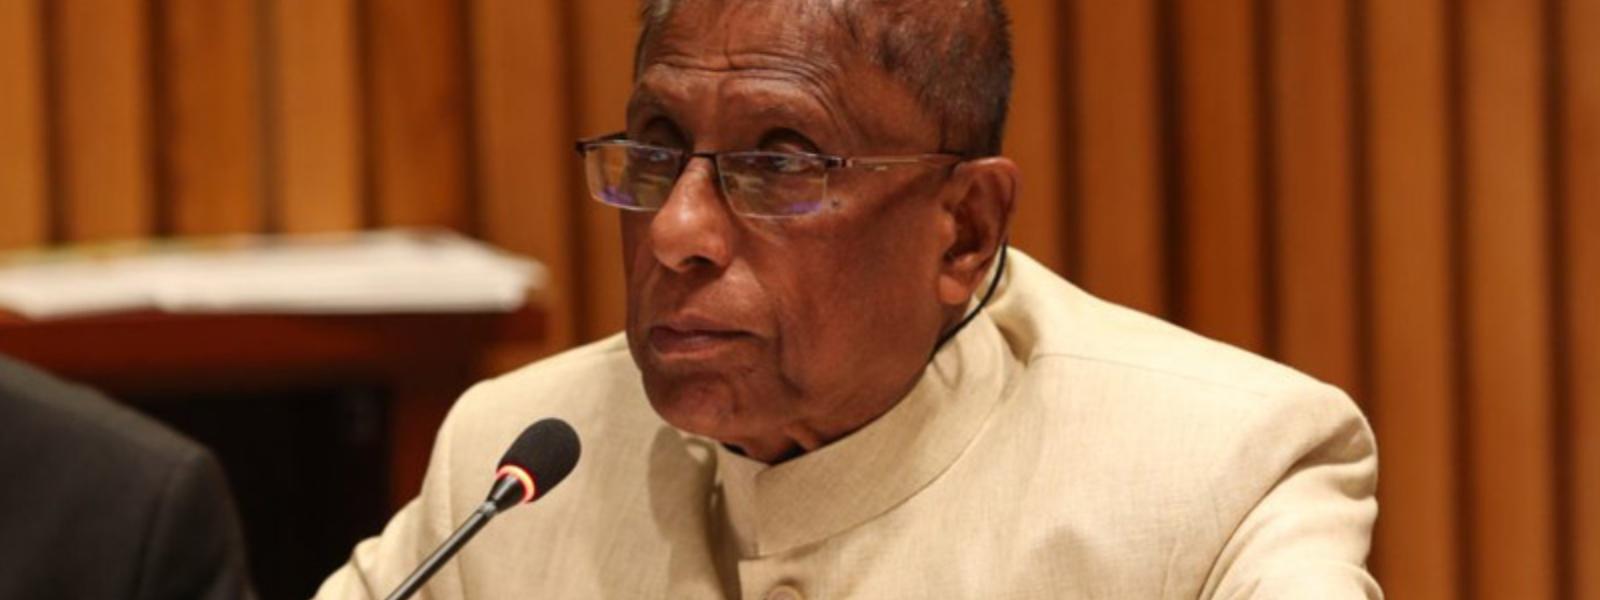 Min. Gamini Jayawickrama to provide a statement on Mahapola irregularities